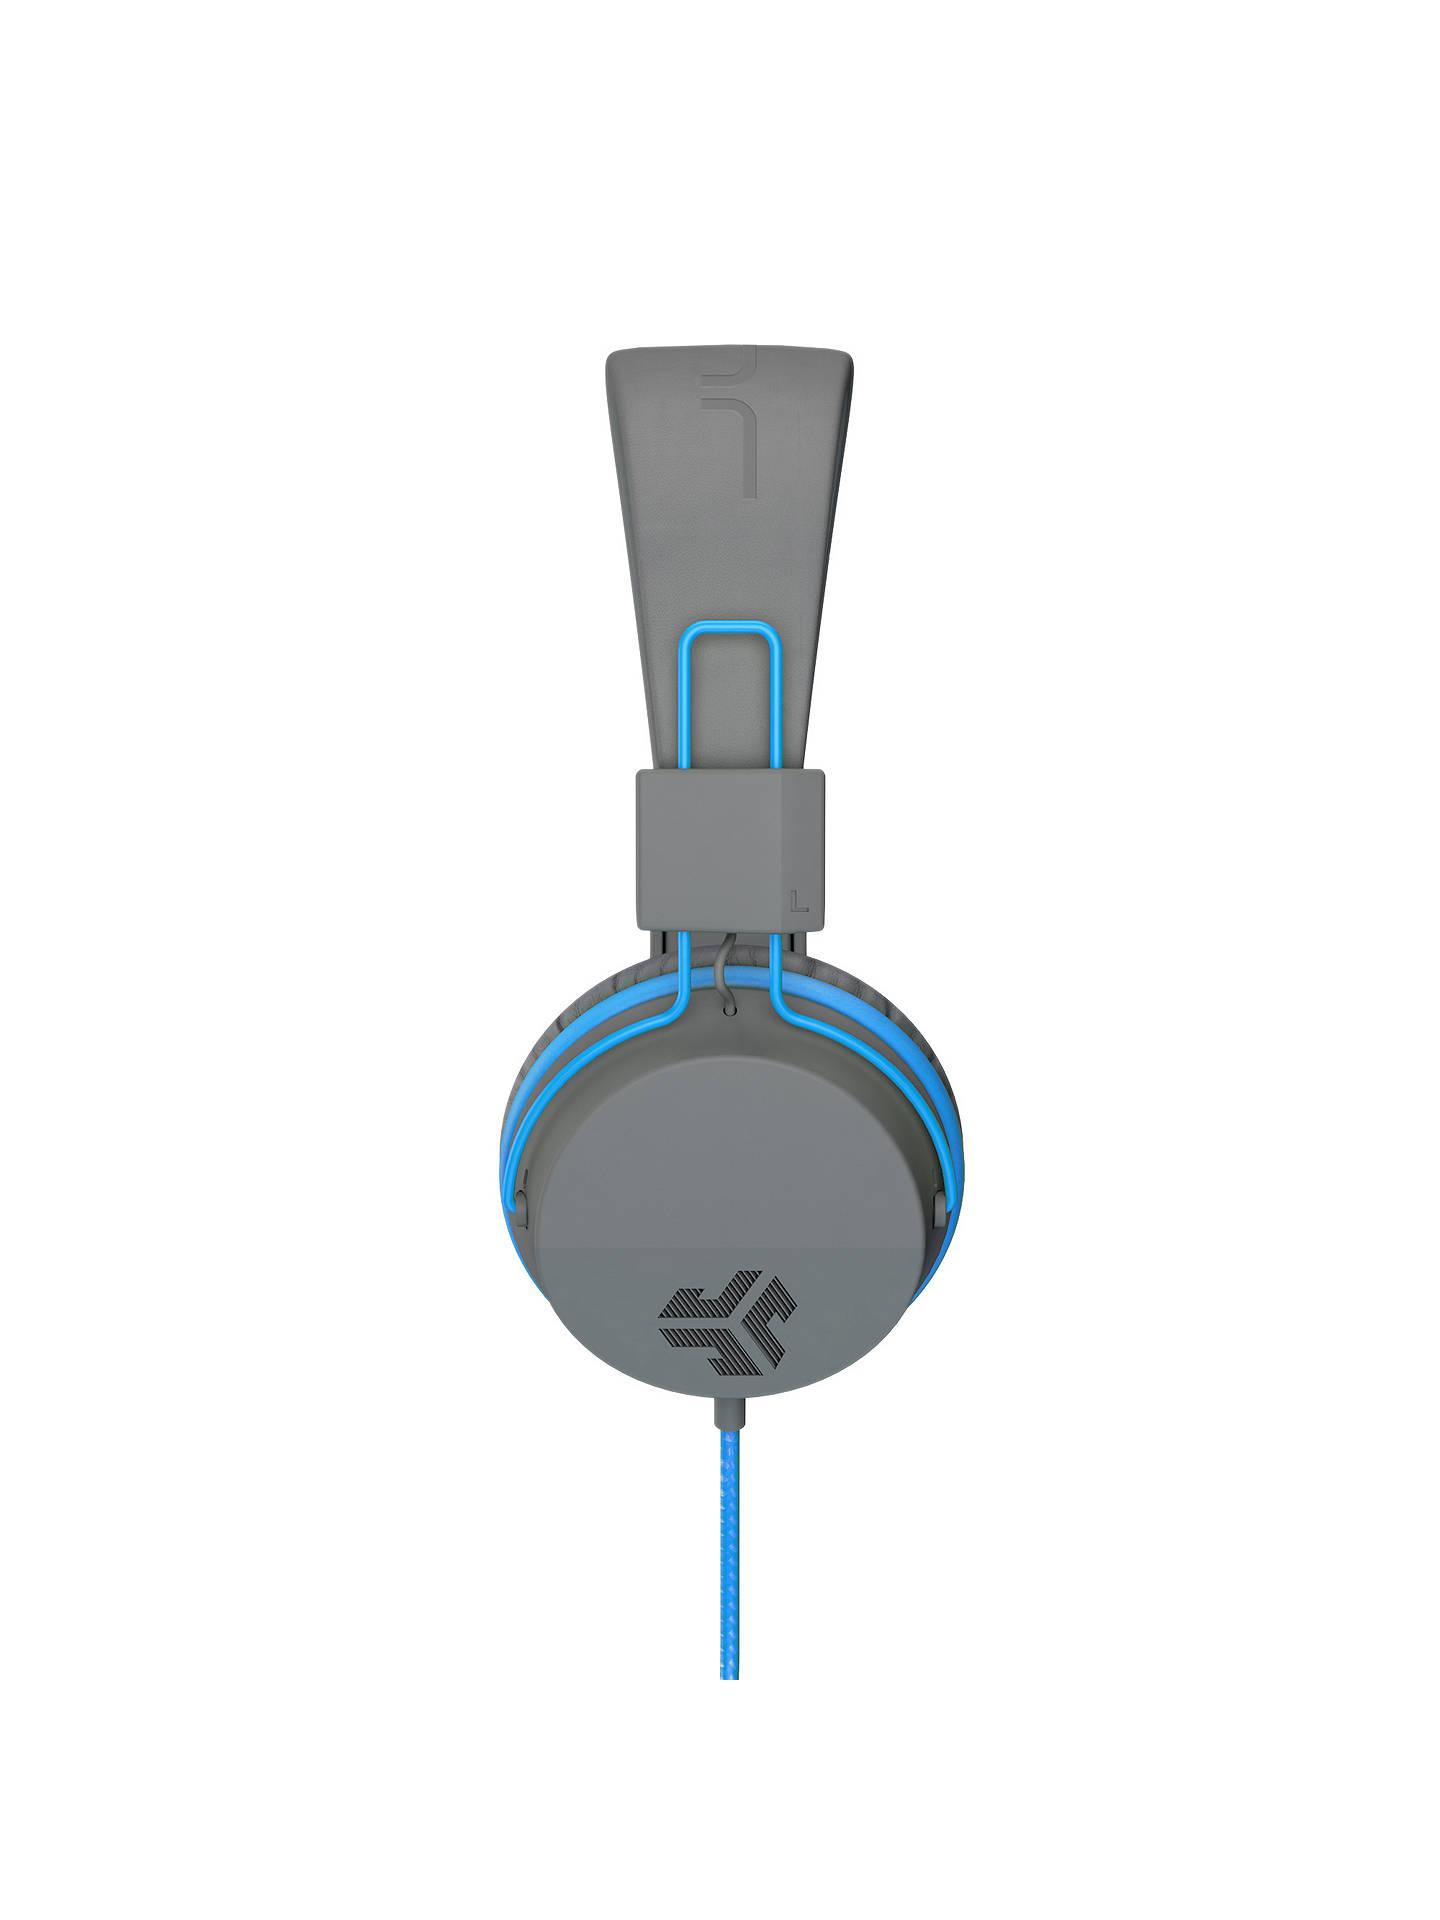 a0c2fbfb9fa ... Buy JLab Audio JBuddies Studio Children's Volume Limiting Over-Ear  Headphones with Mic/Remote ...